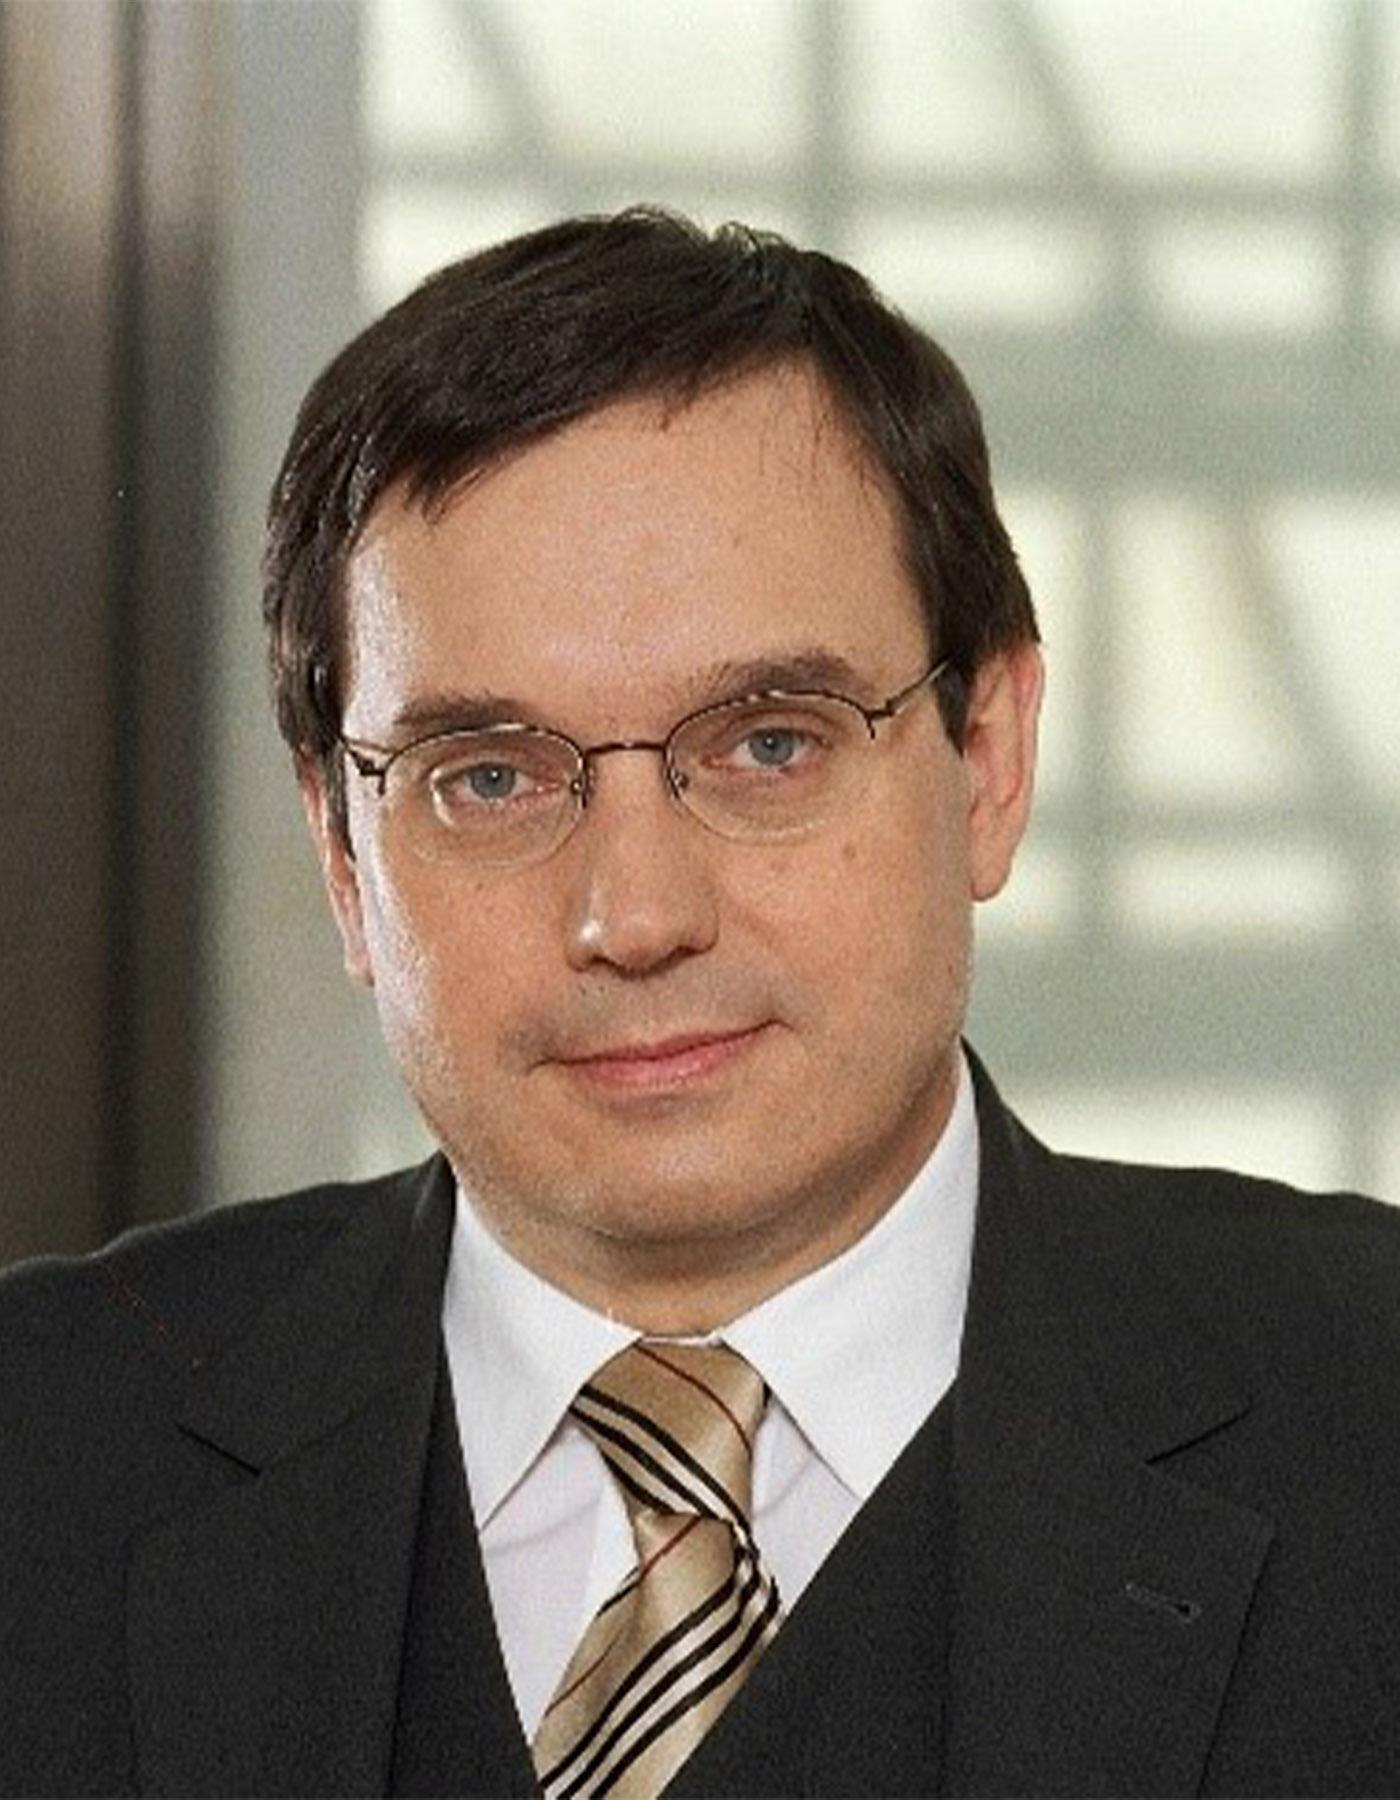 Dr. Josef Schmidinger